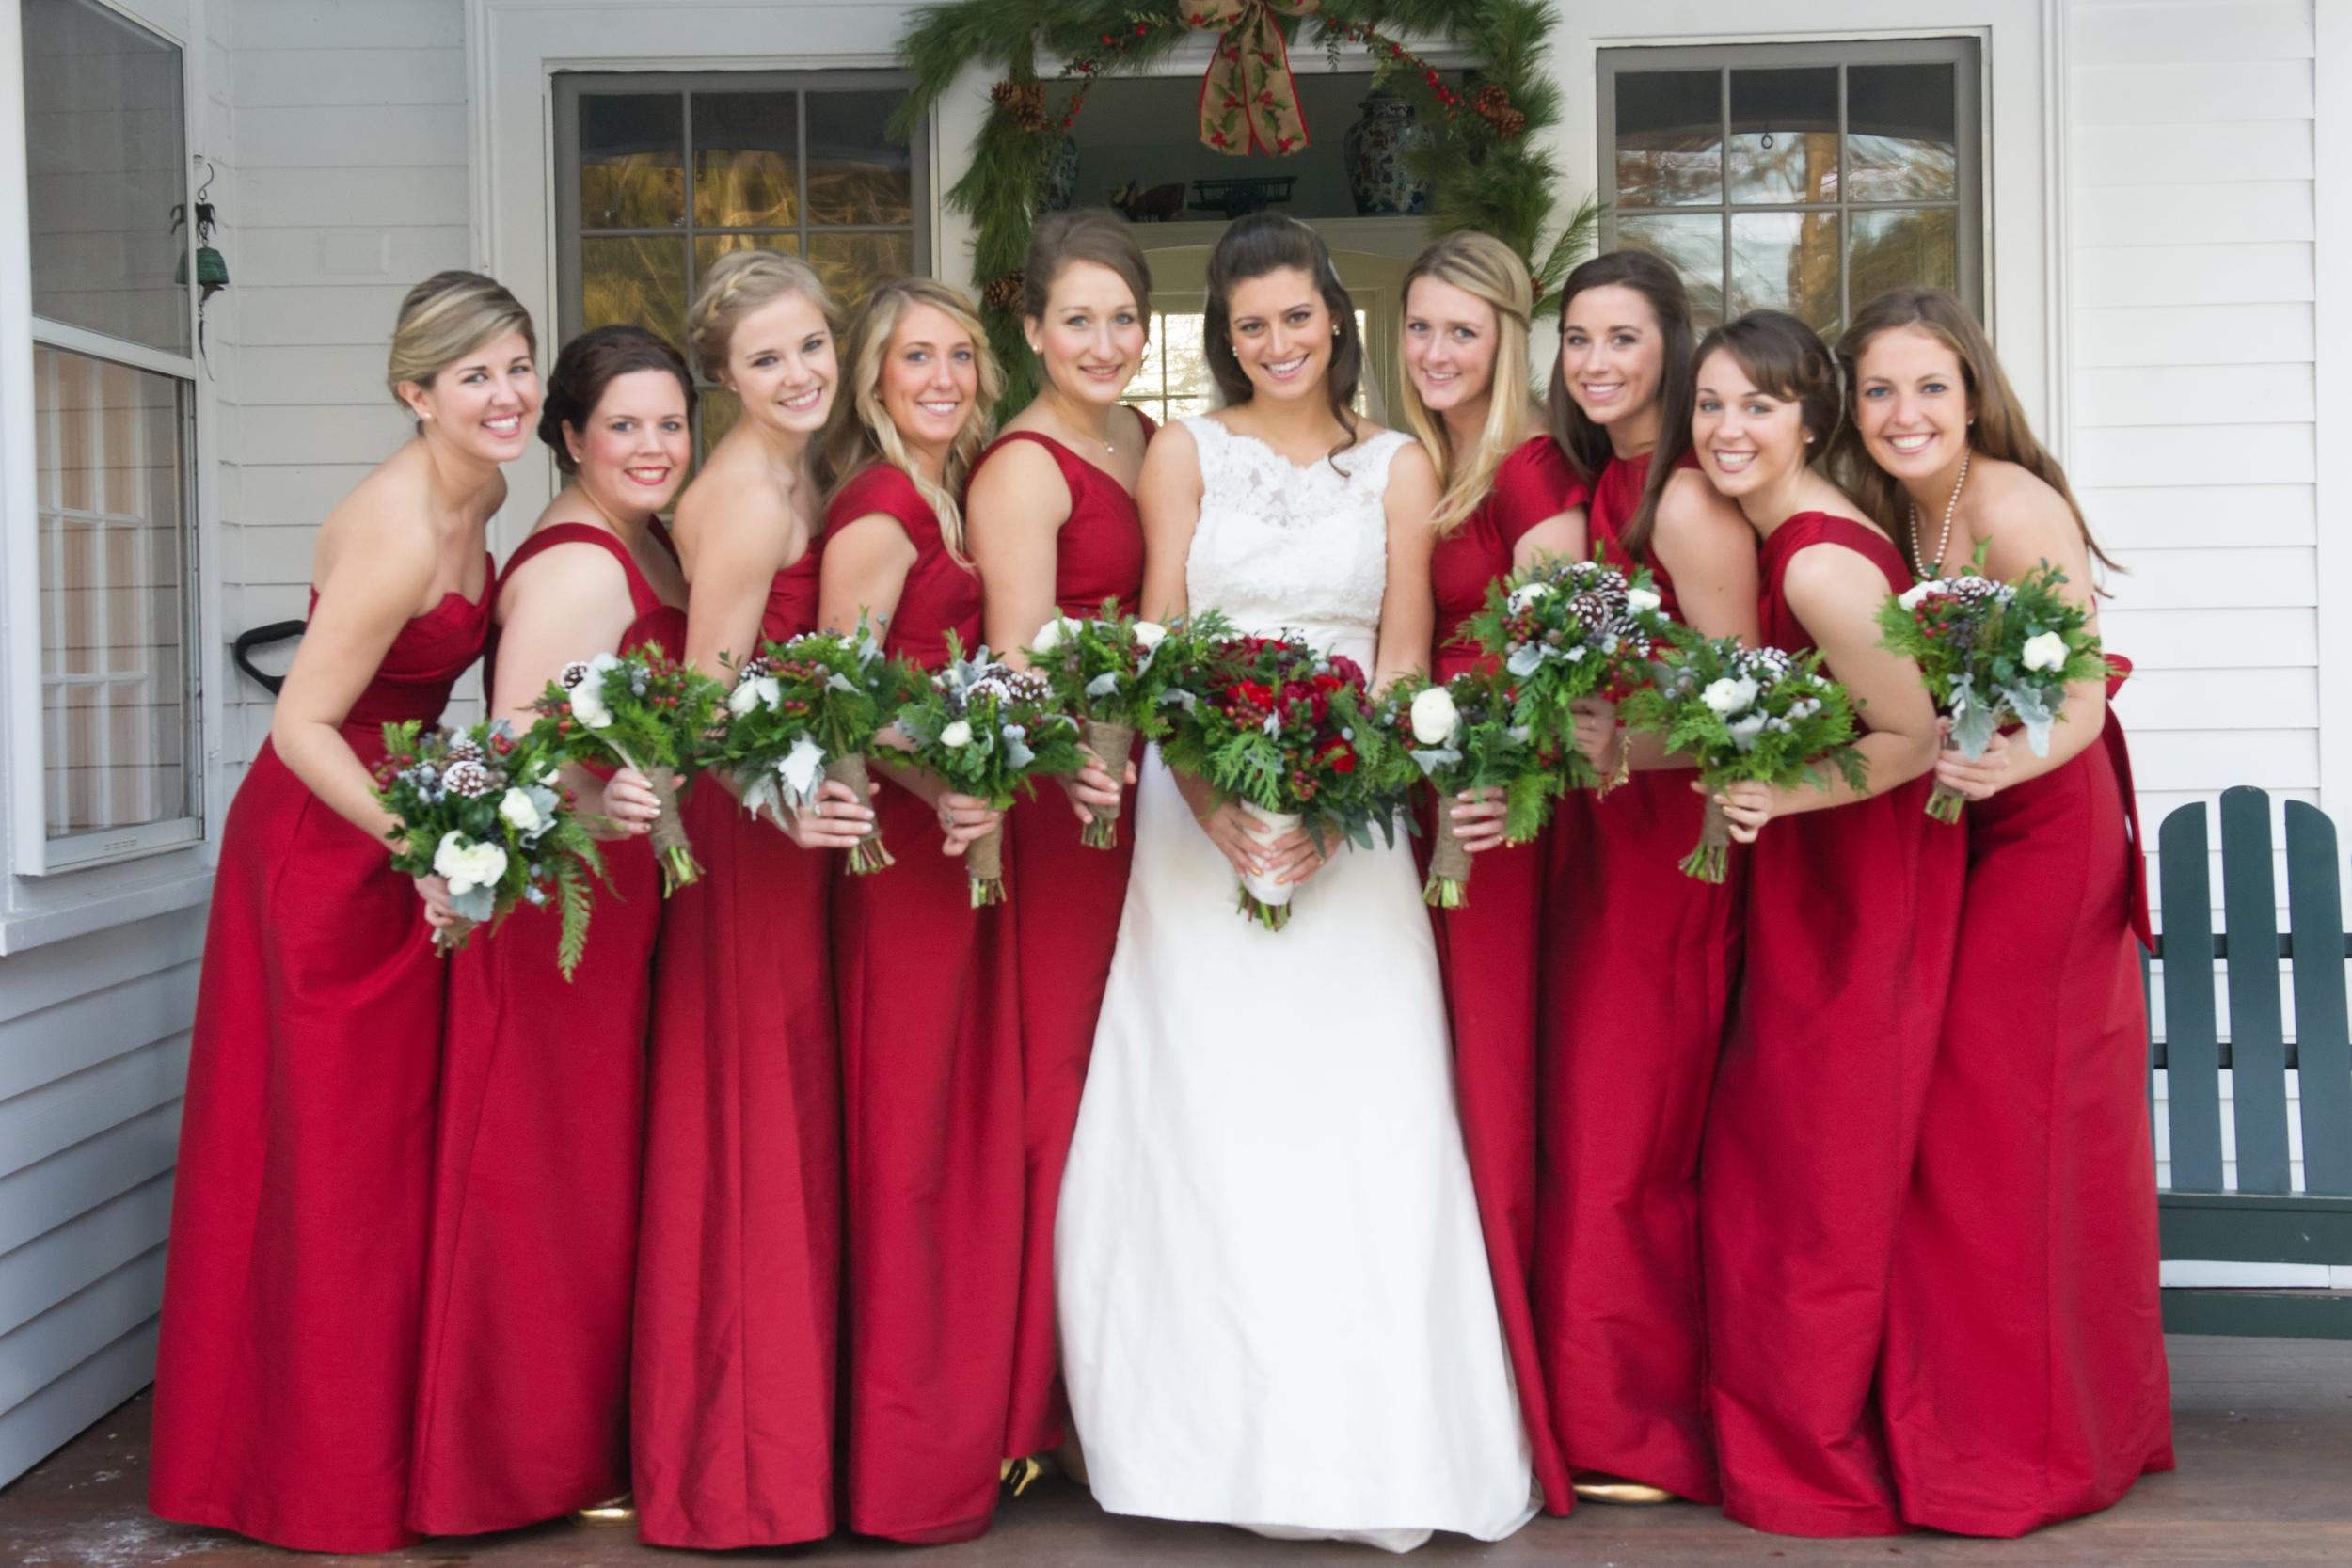 Winter Wedding | Our Wedding | The Gallivant | Wedding photographer Leah Haydock